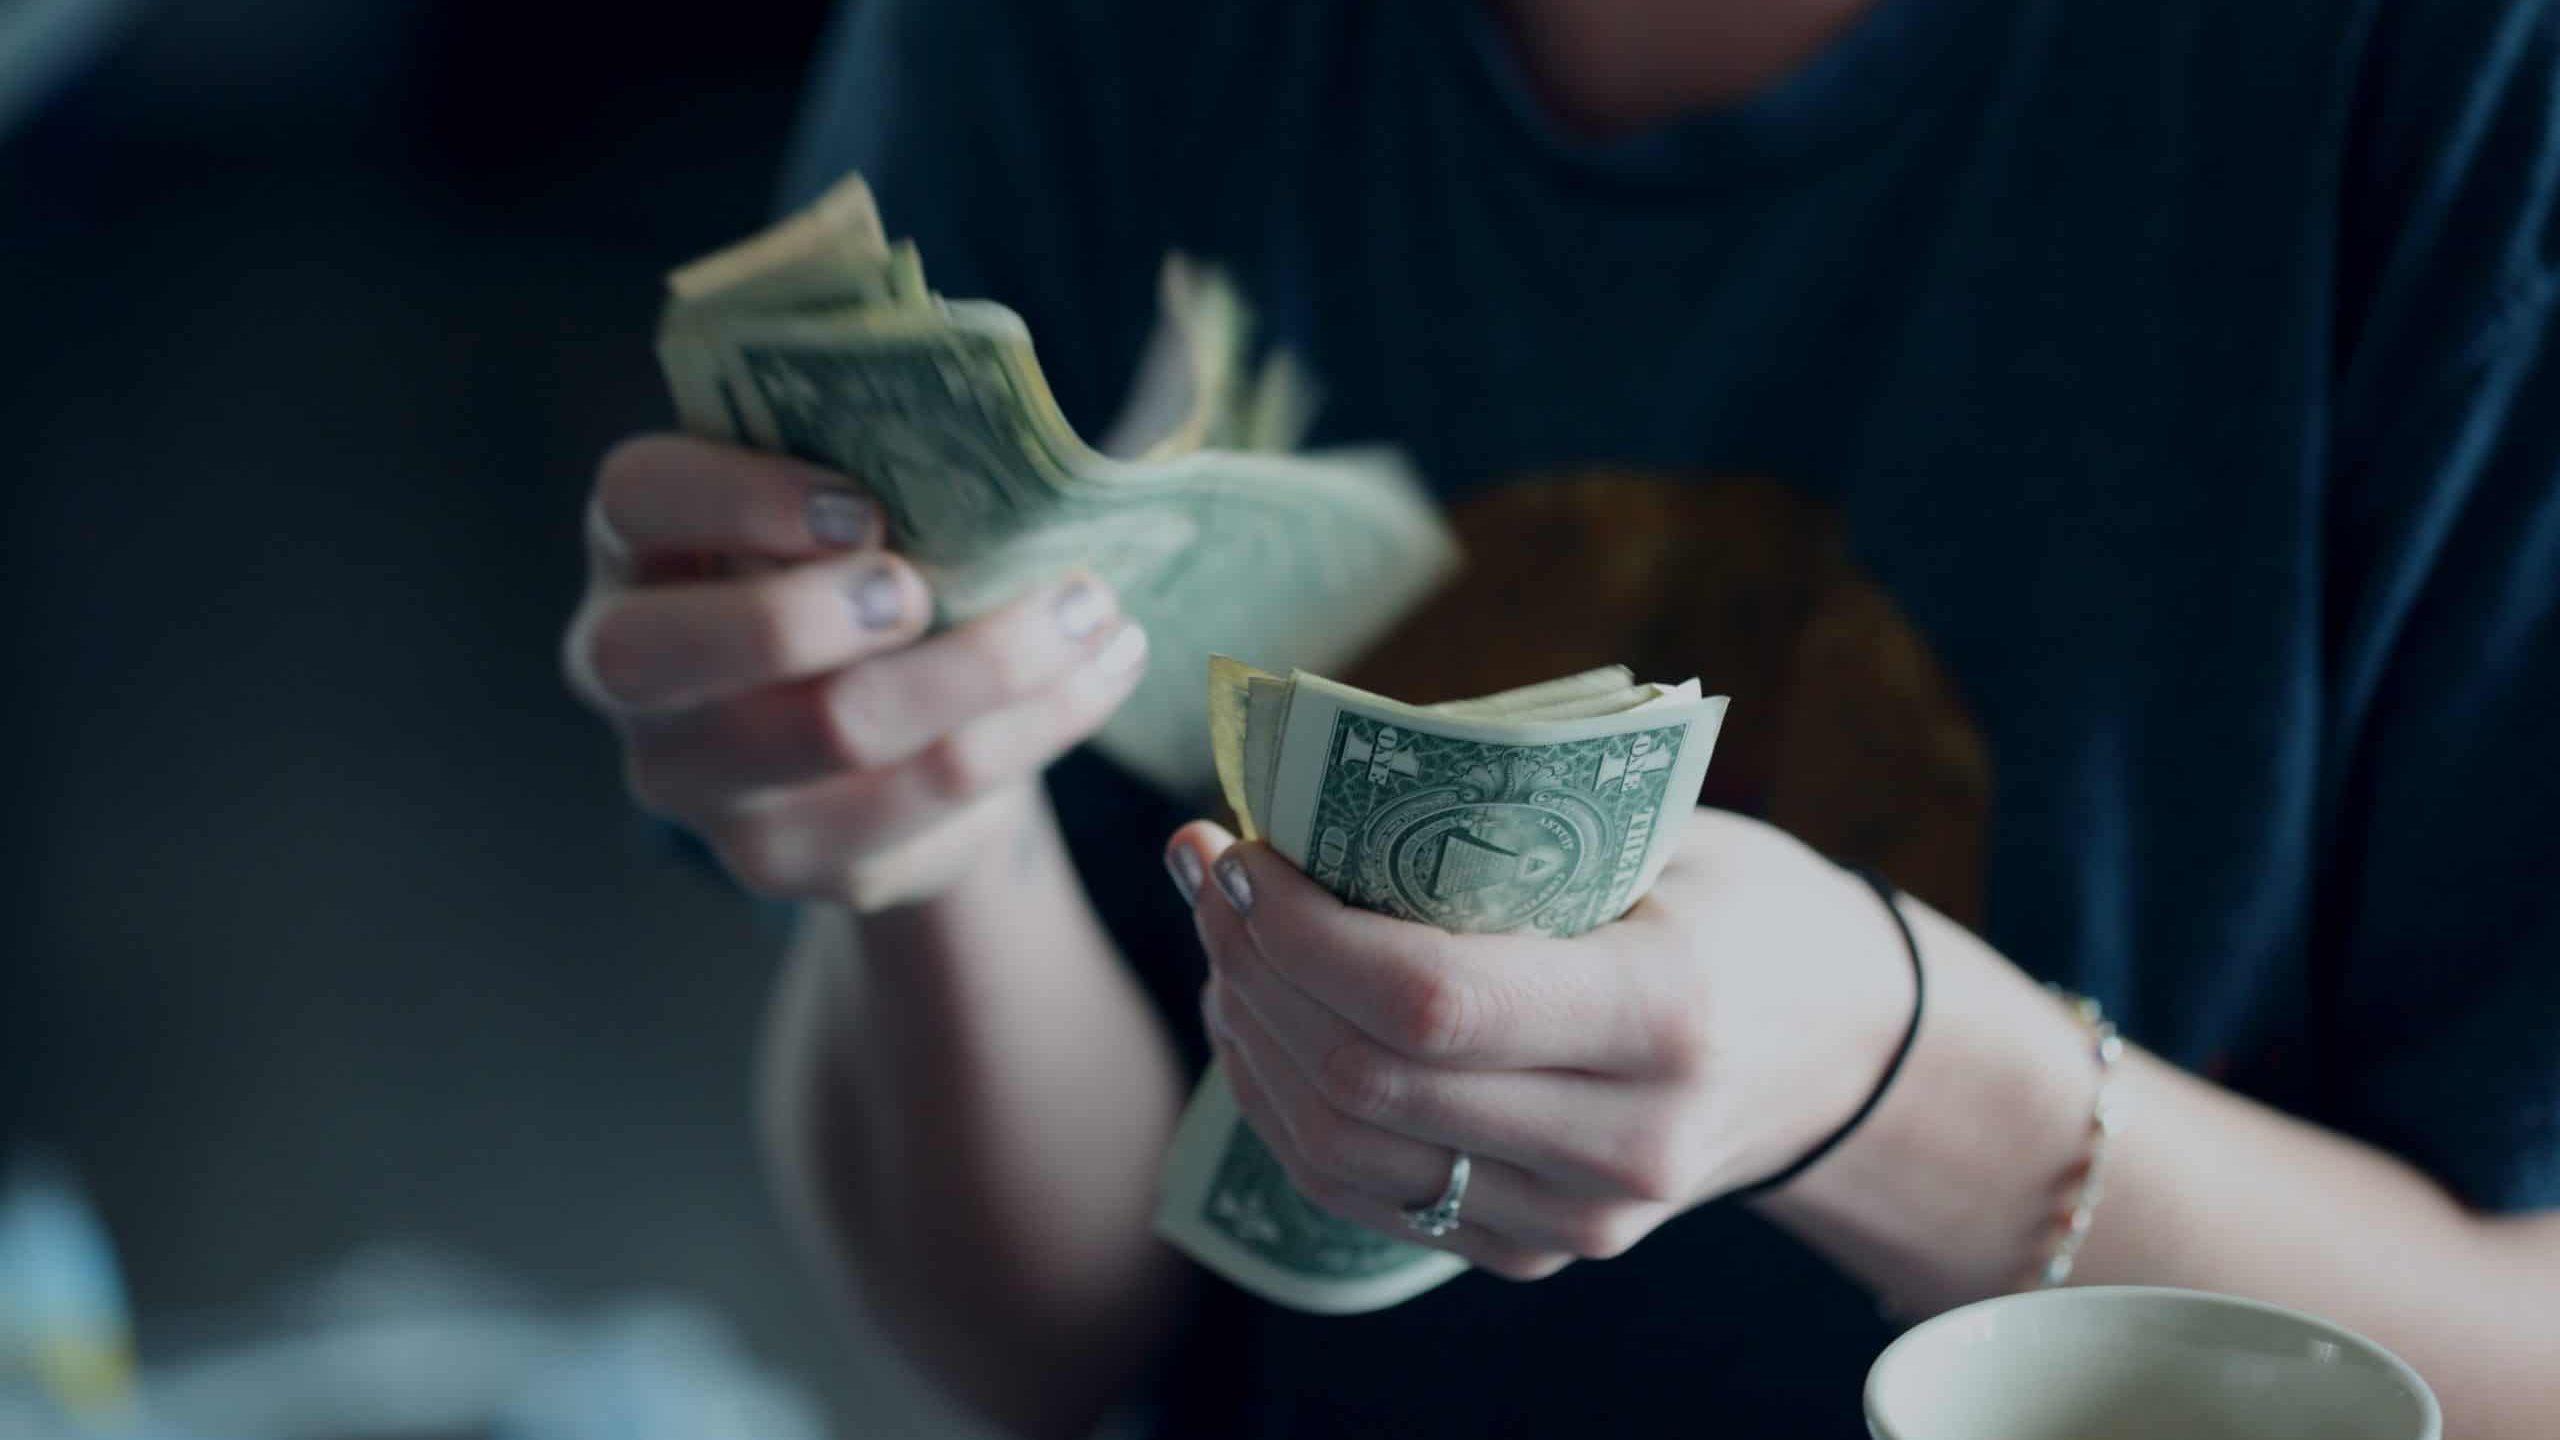 FCC Tops $1 Billion in Emergency Broadband Fund First Wave